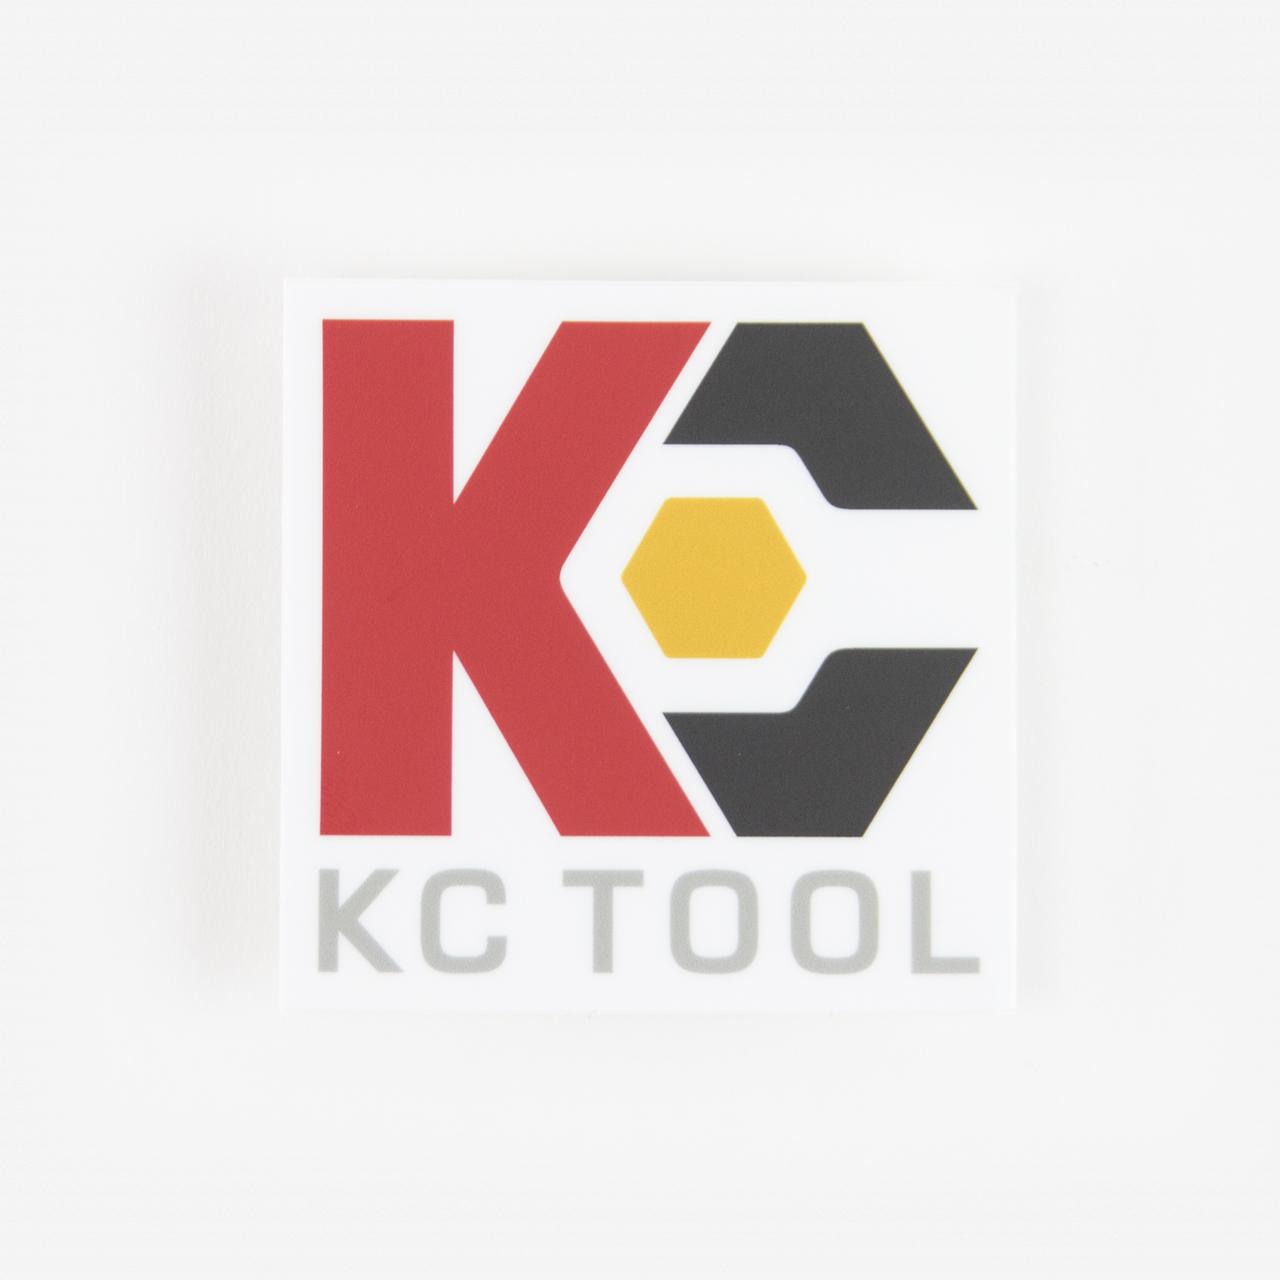 KC Tool Sticker  - KC Tool